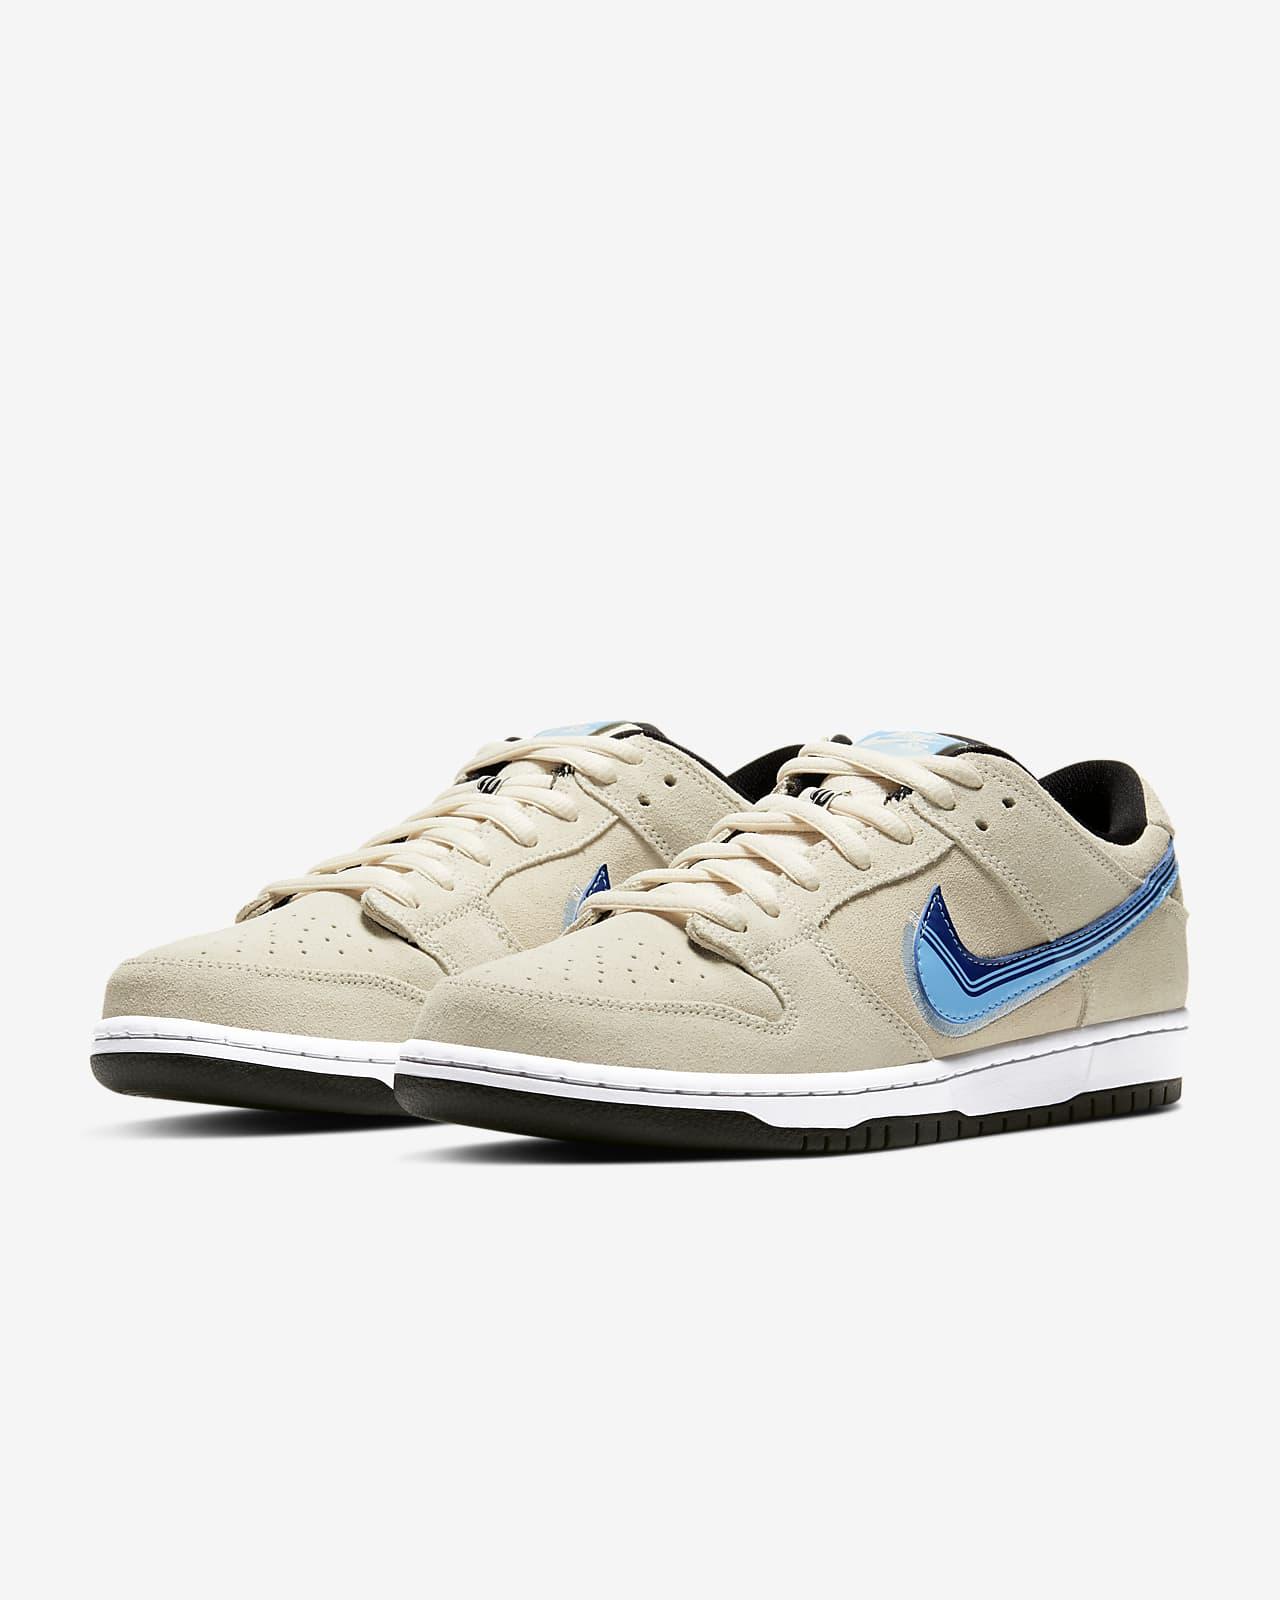 Nike SB Dunk Low Pro Skate Shoe. Nike ID